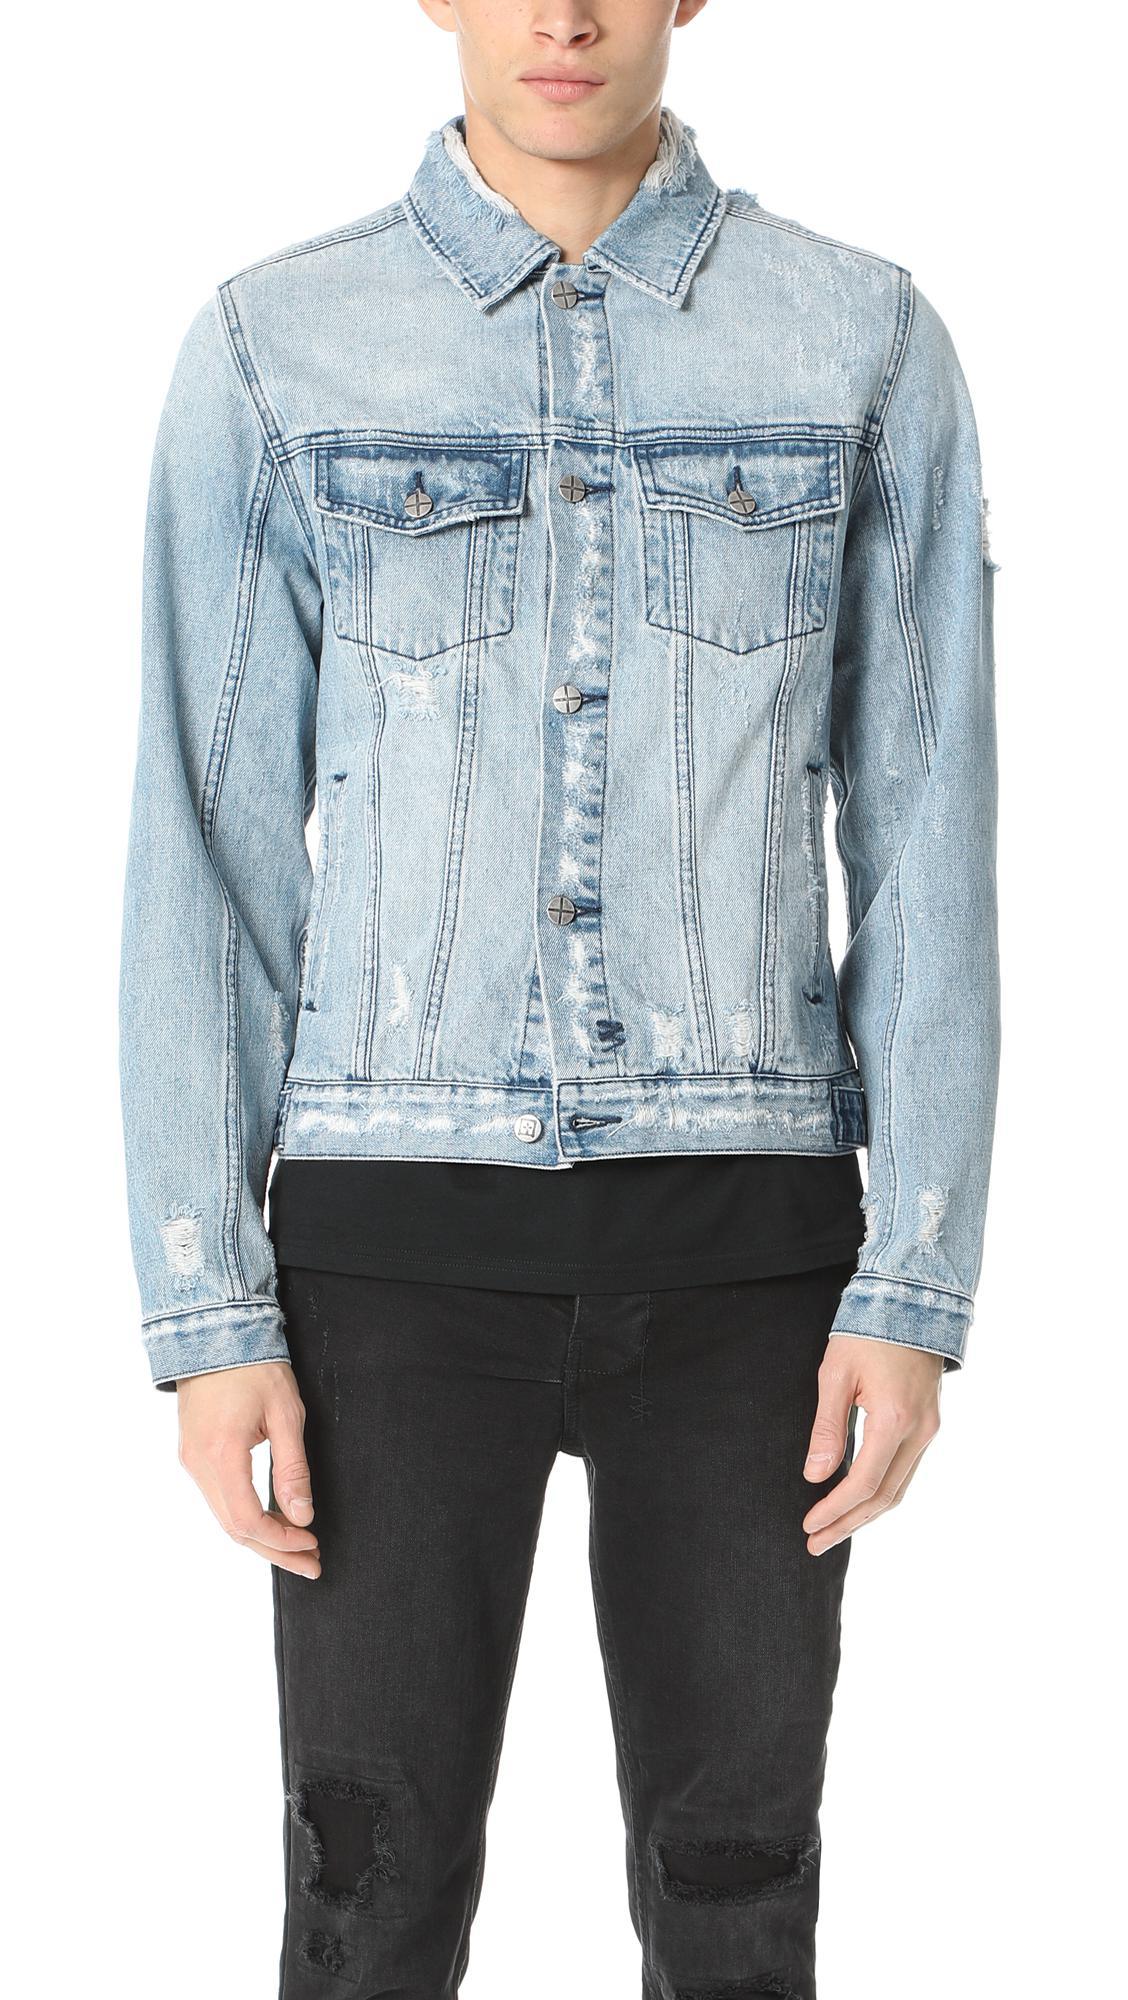 ce99317632 Lyst - Ksubi Classic Denim Jacket in Blue for Men - Save 37%